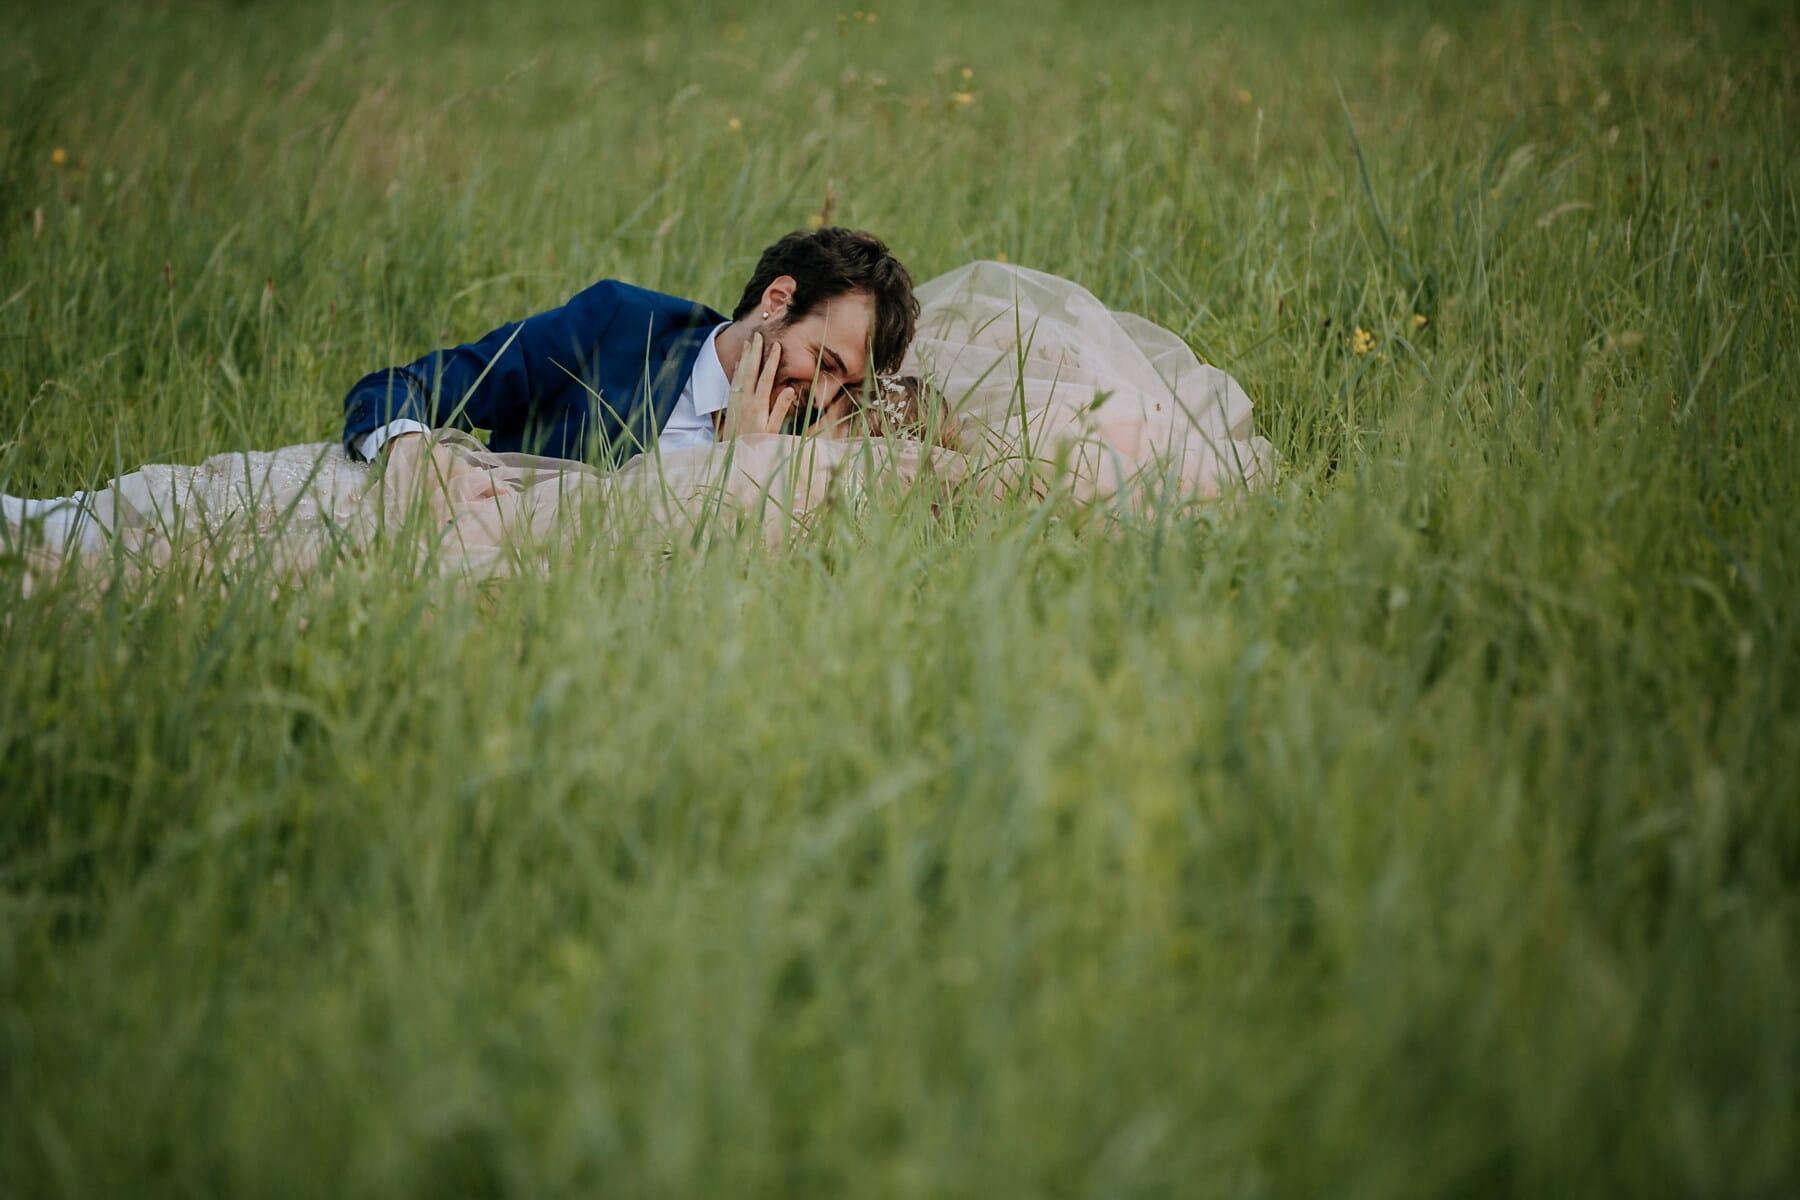 girlfriend, romantic, boyfriend, grass, love, love date, laying, field, girl, relaxation